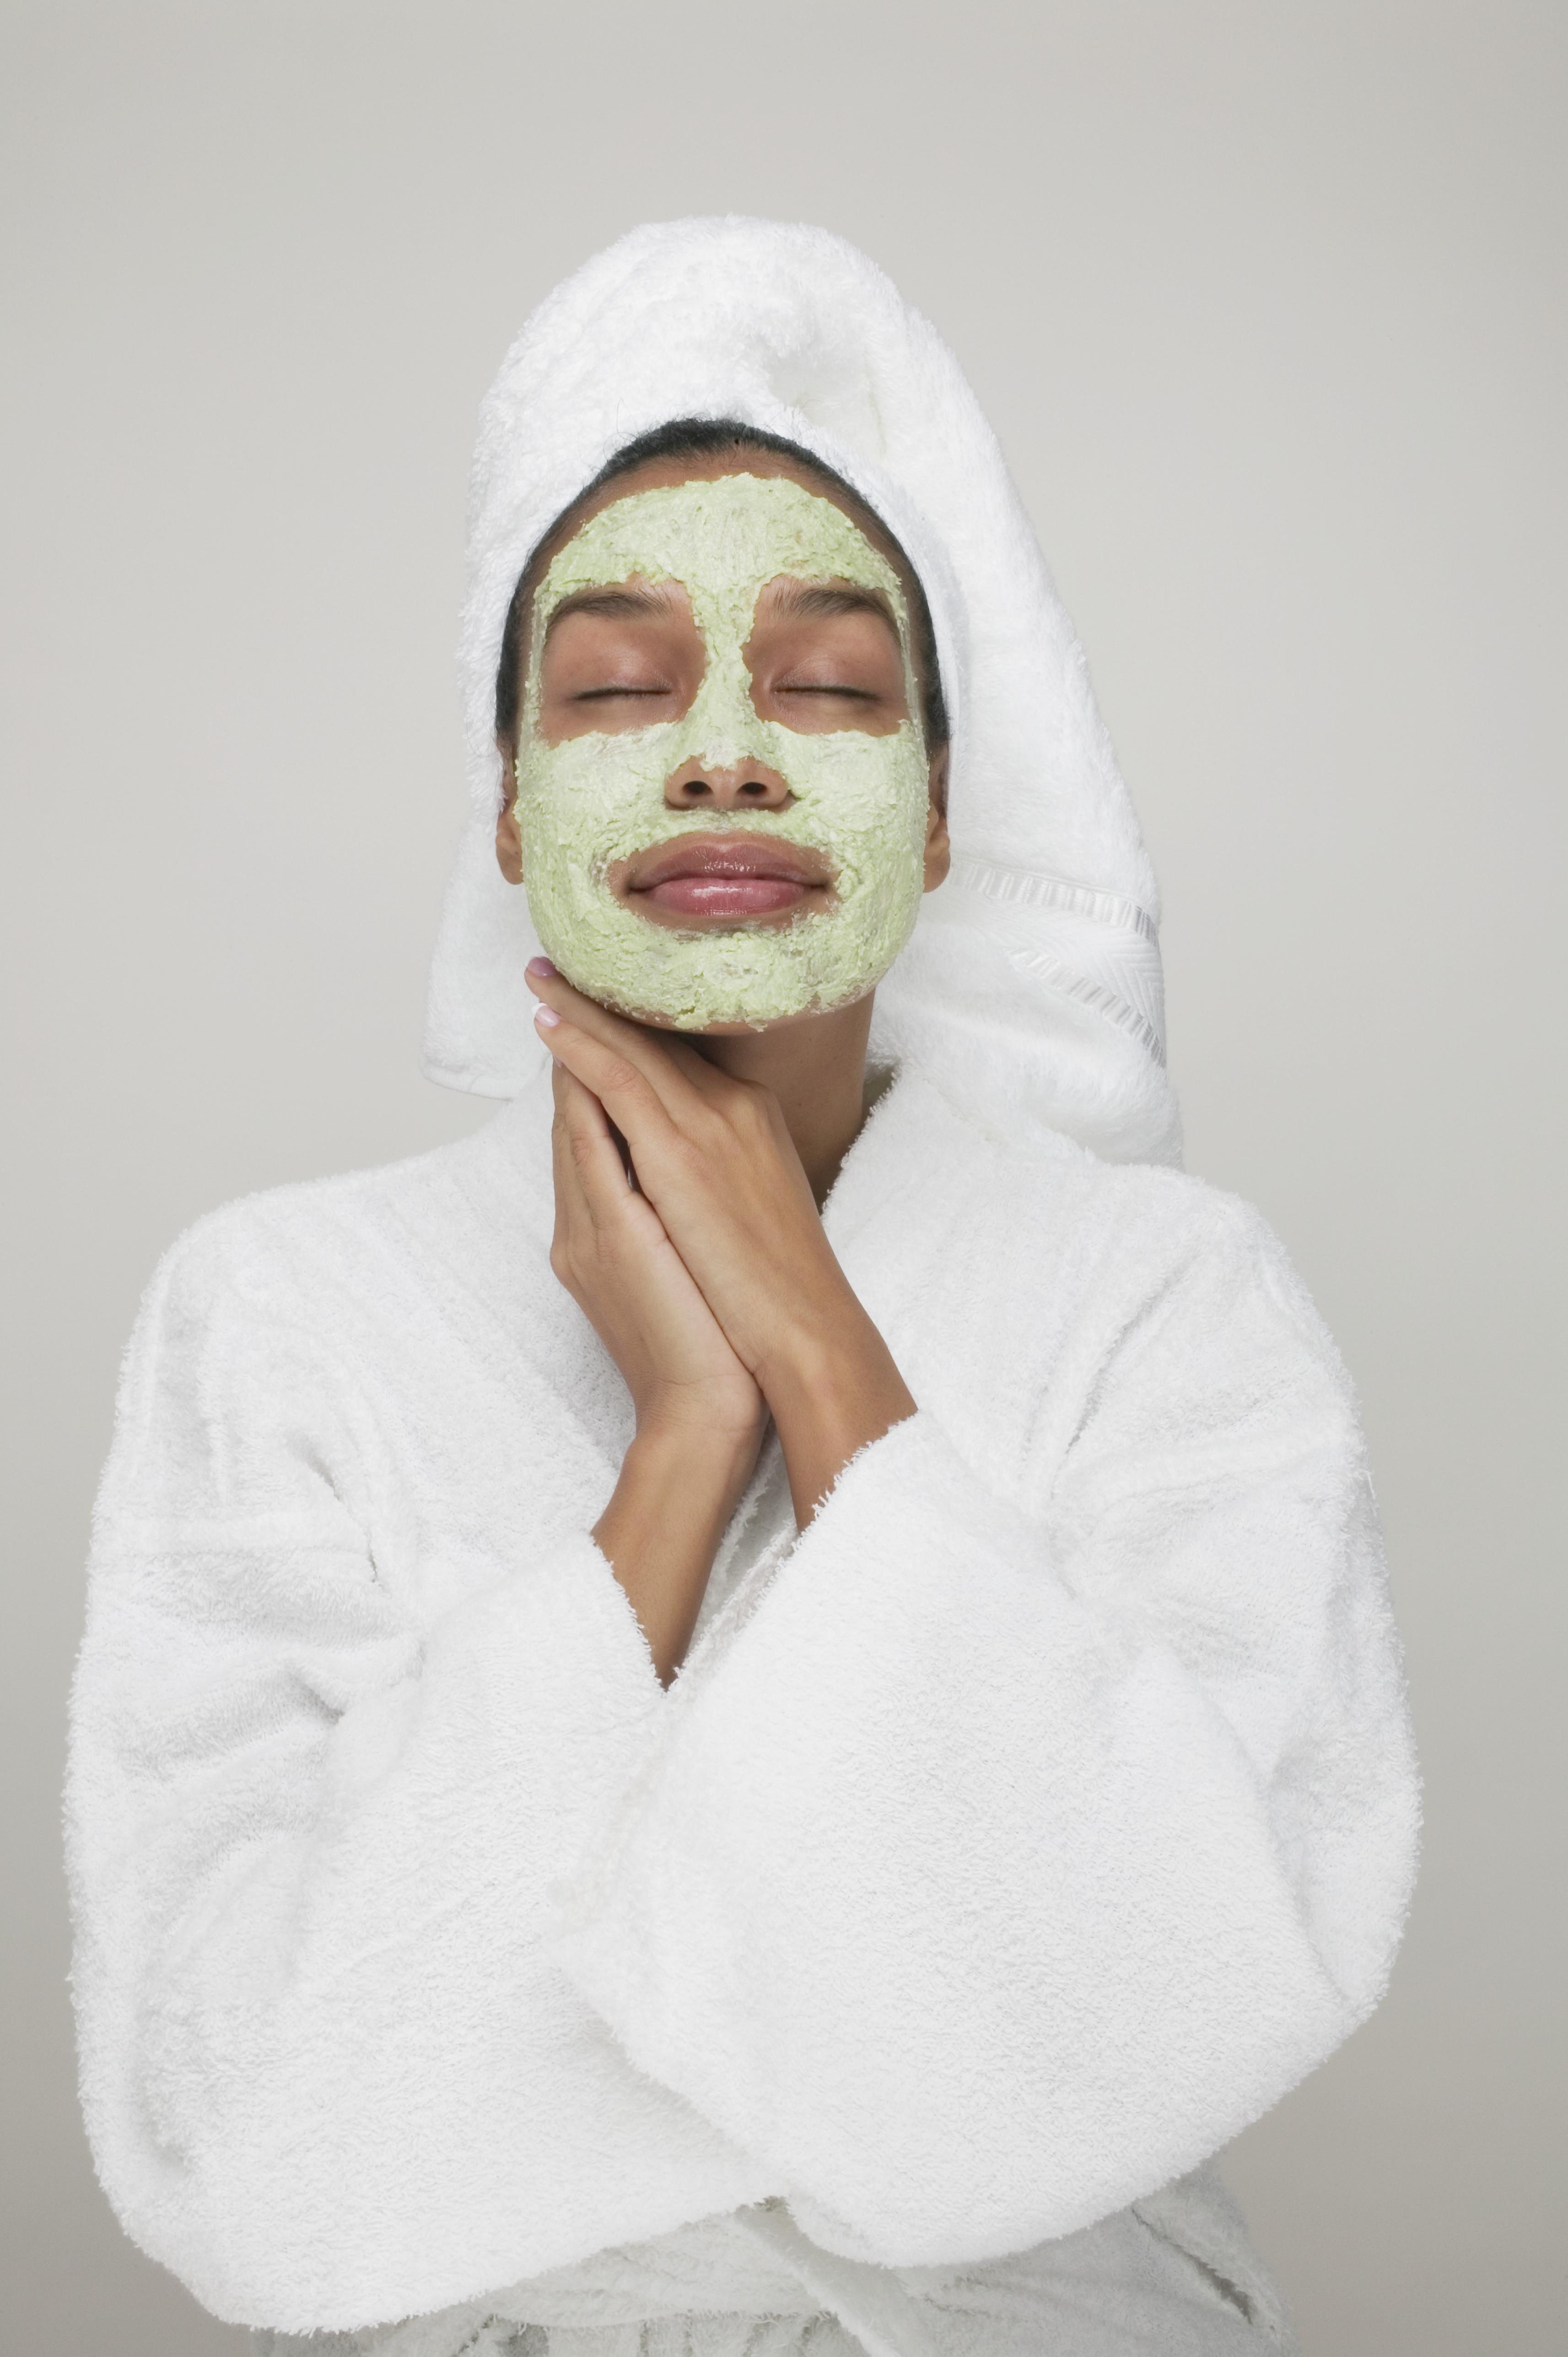 Young woman wearing a facial mask